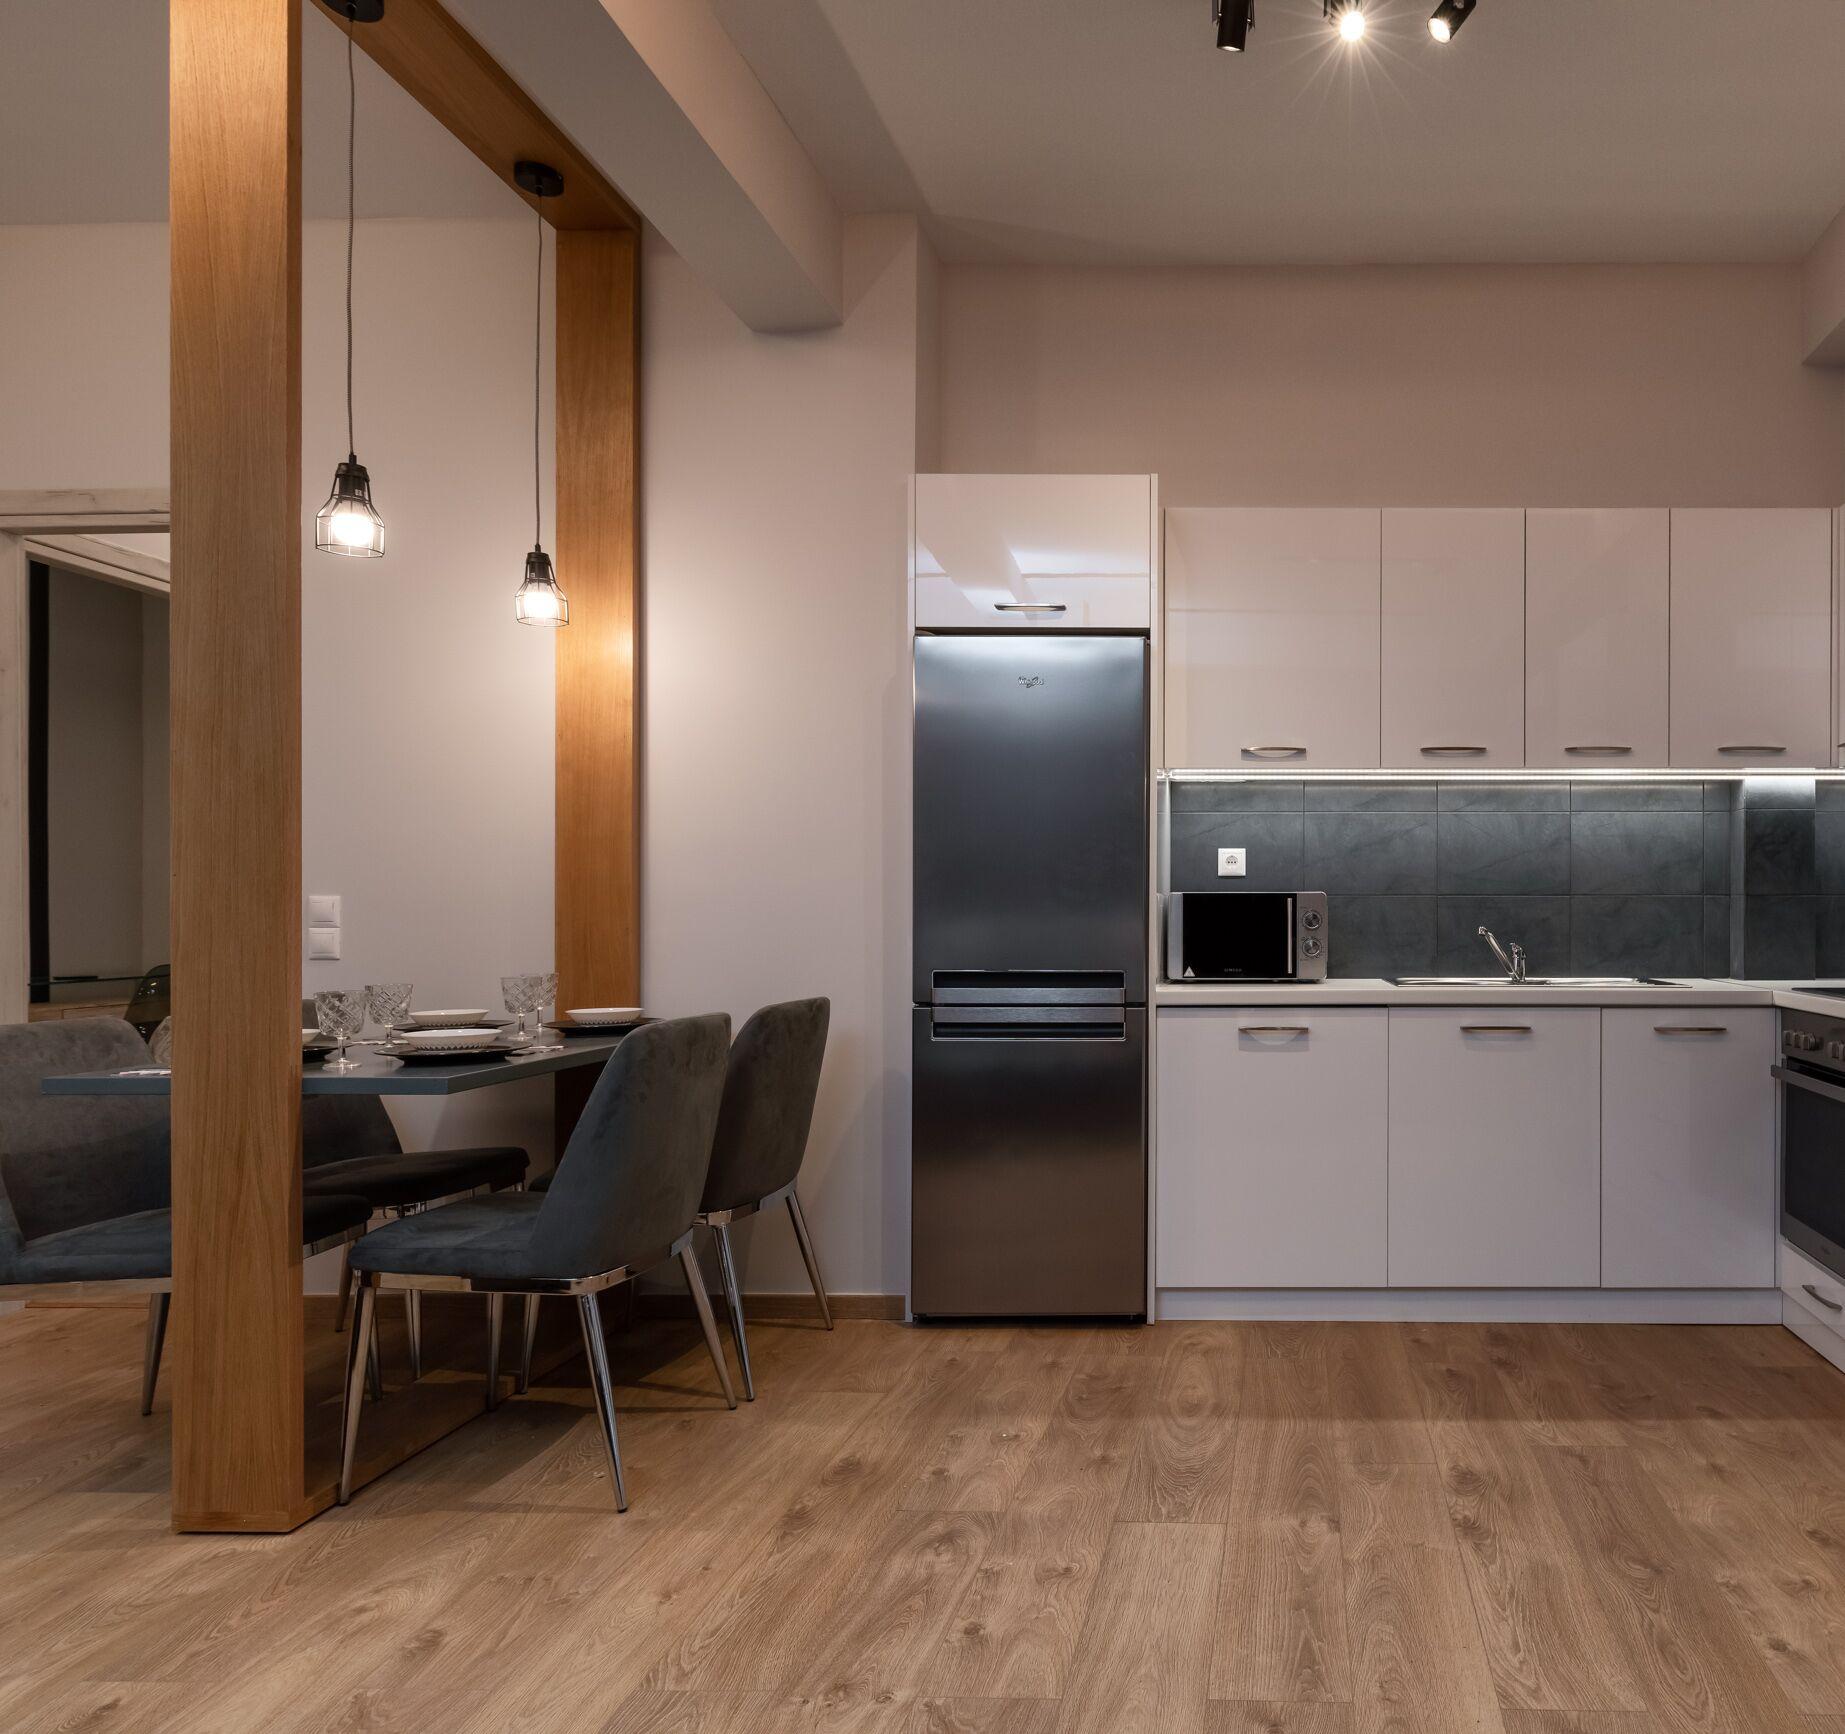 101m² Renovated Apartment In Koukaki